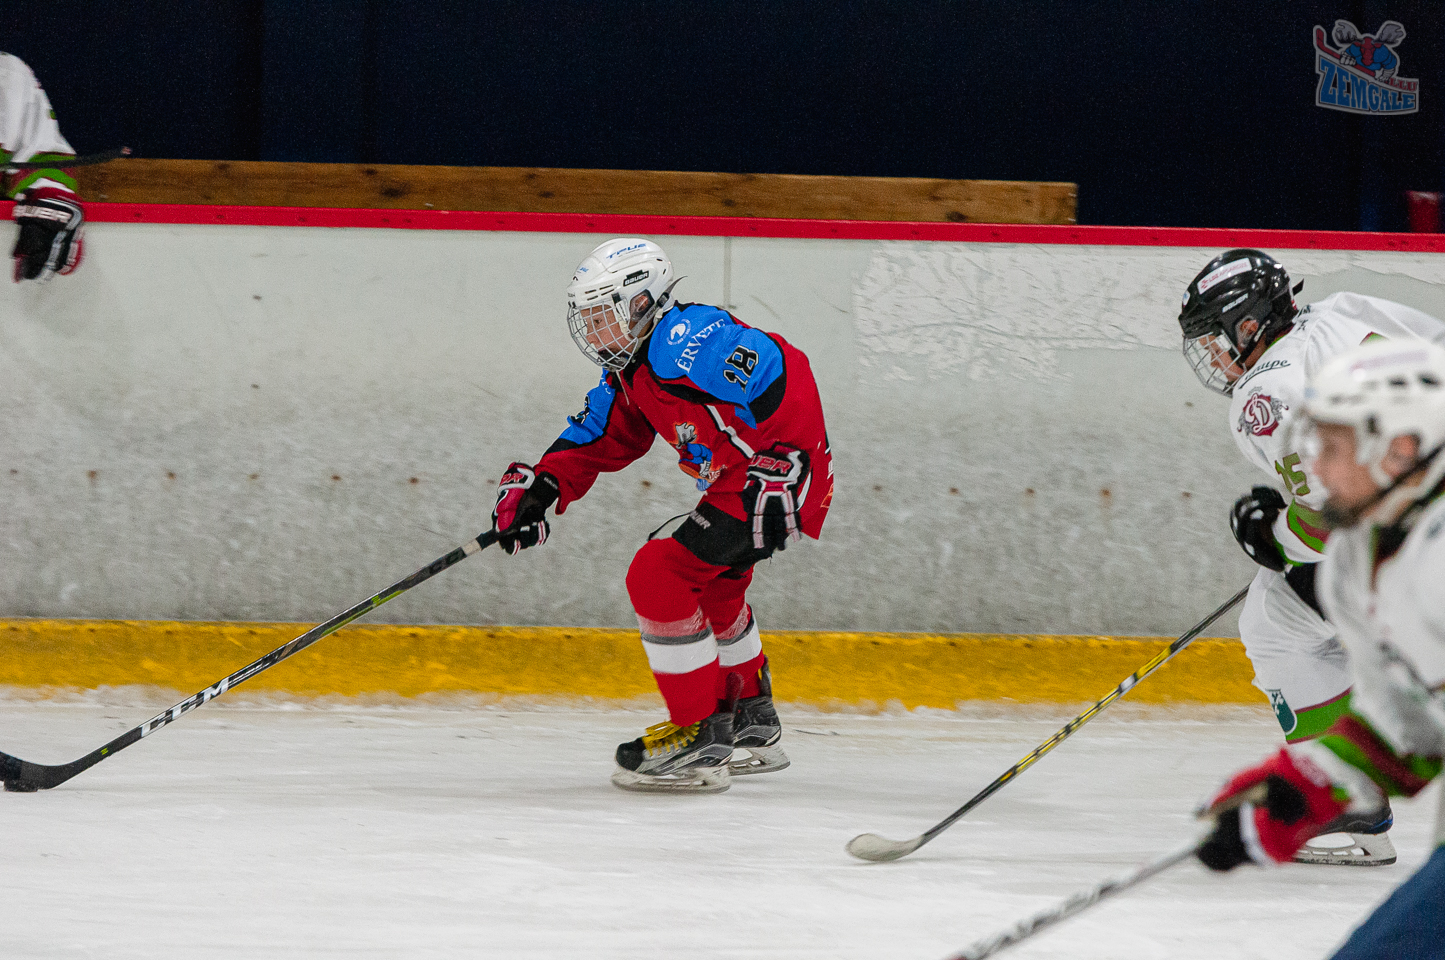 Hokeja skola JLSS U13 A - Mārupes HS 21092019-06